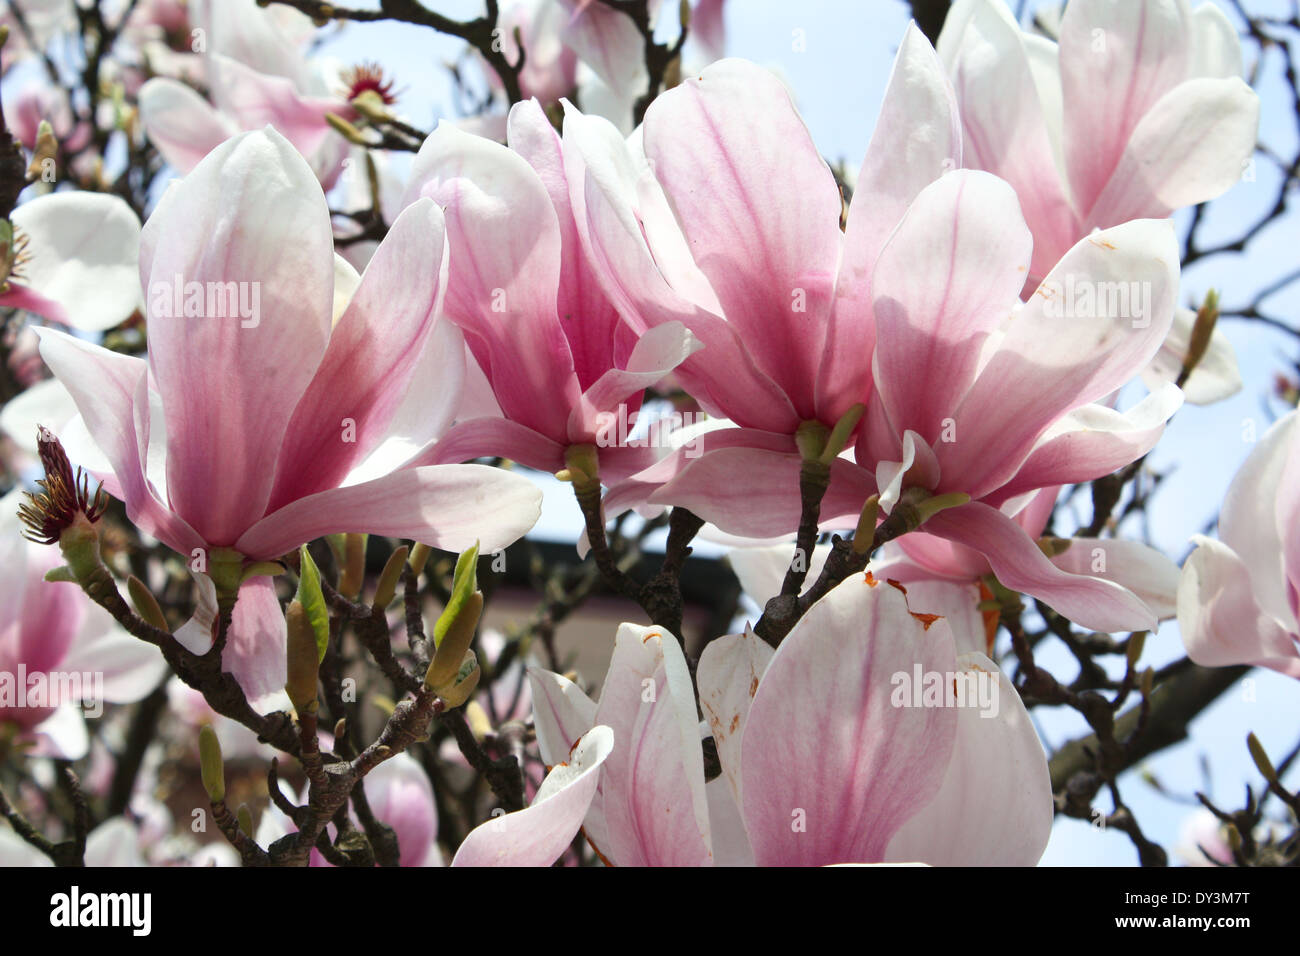 Pink magnolia flowers in spring season Stock Photo